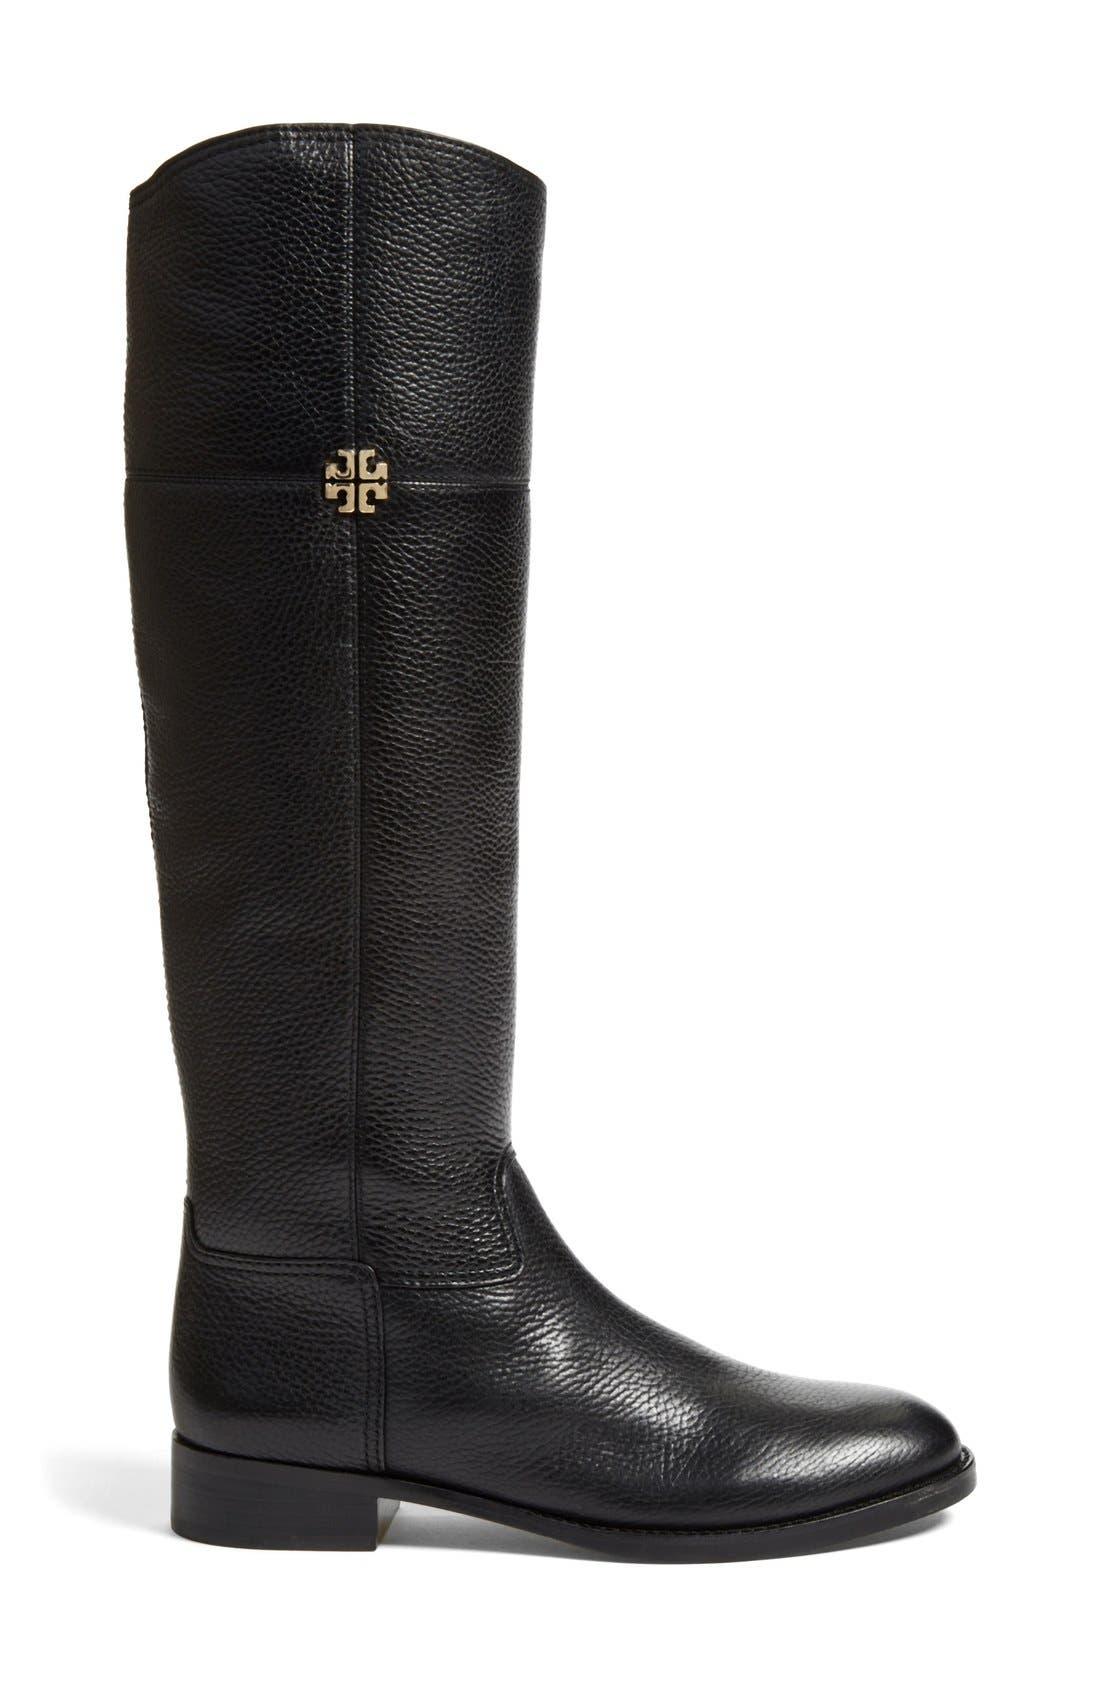 'Jolie' Riding Boot,                             Alternate thumbnail 4, color,                             Black Tumbled Leather